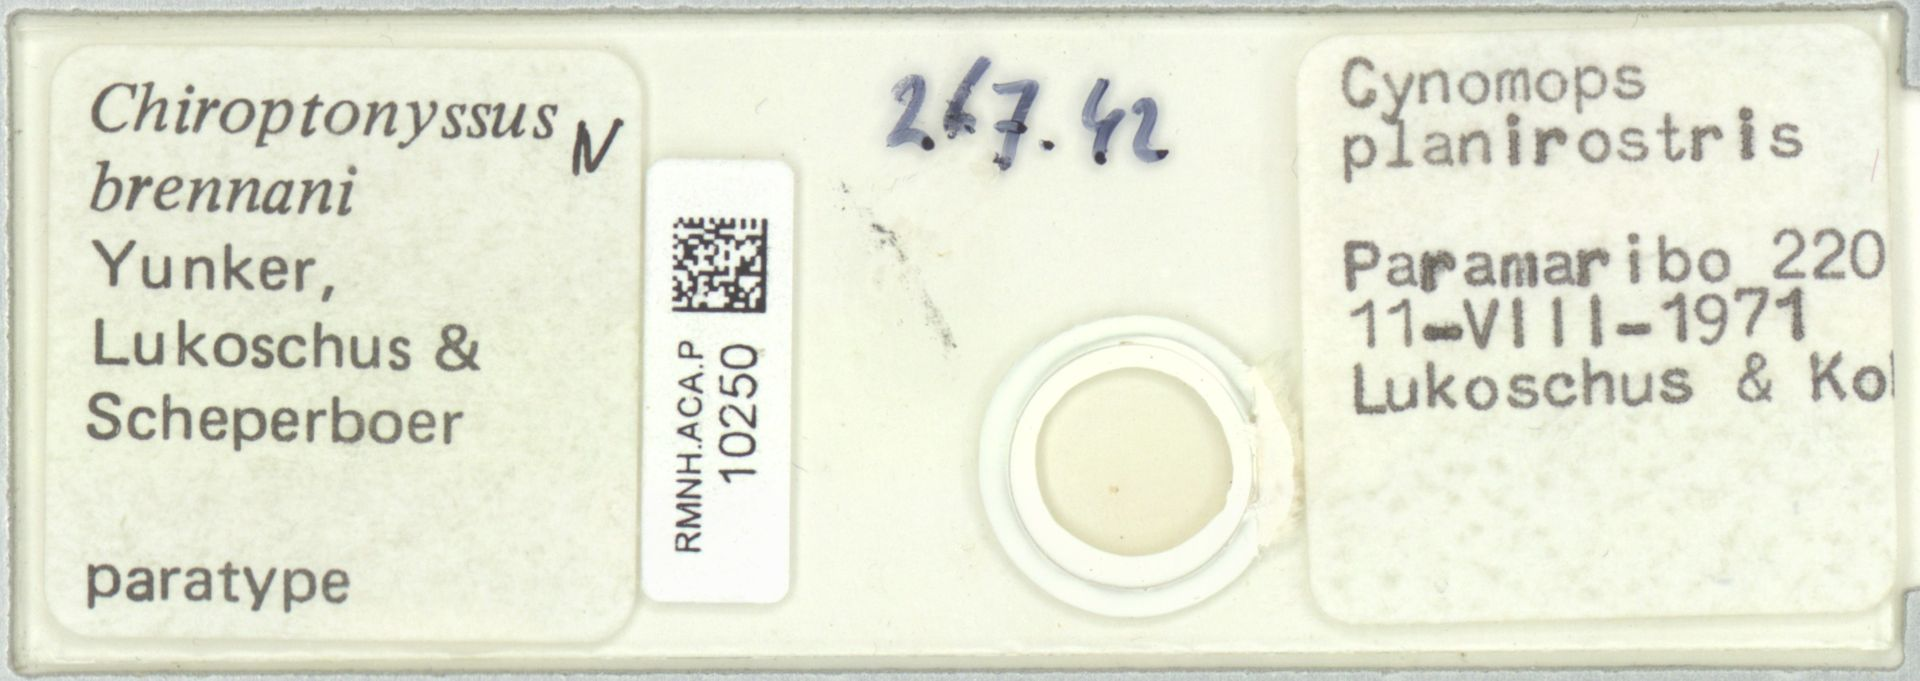 RMNH.ACA.P.10250 | Chiroptonyssus brennani Yunker, Lukoschus & Scheperboer